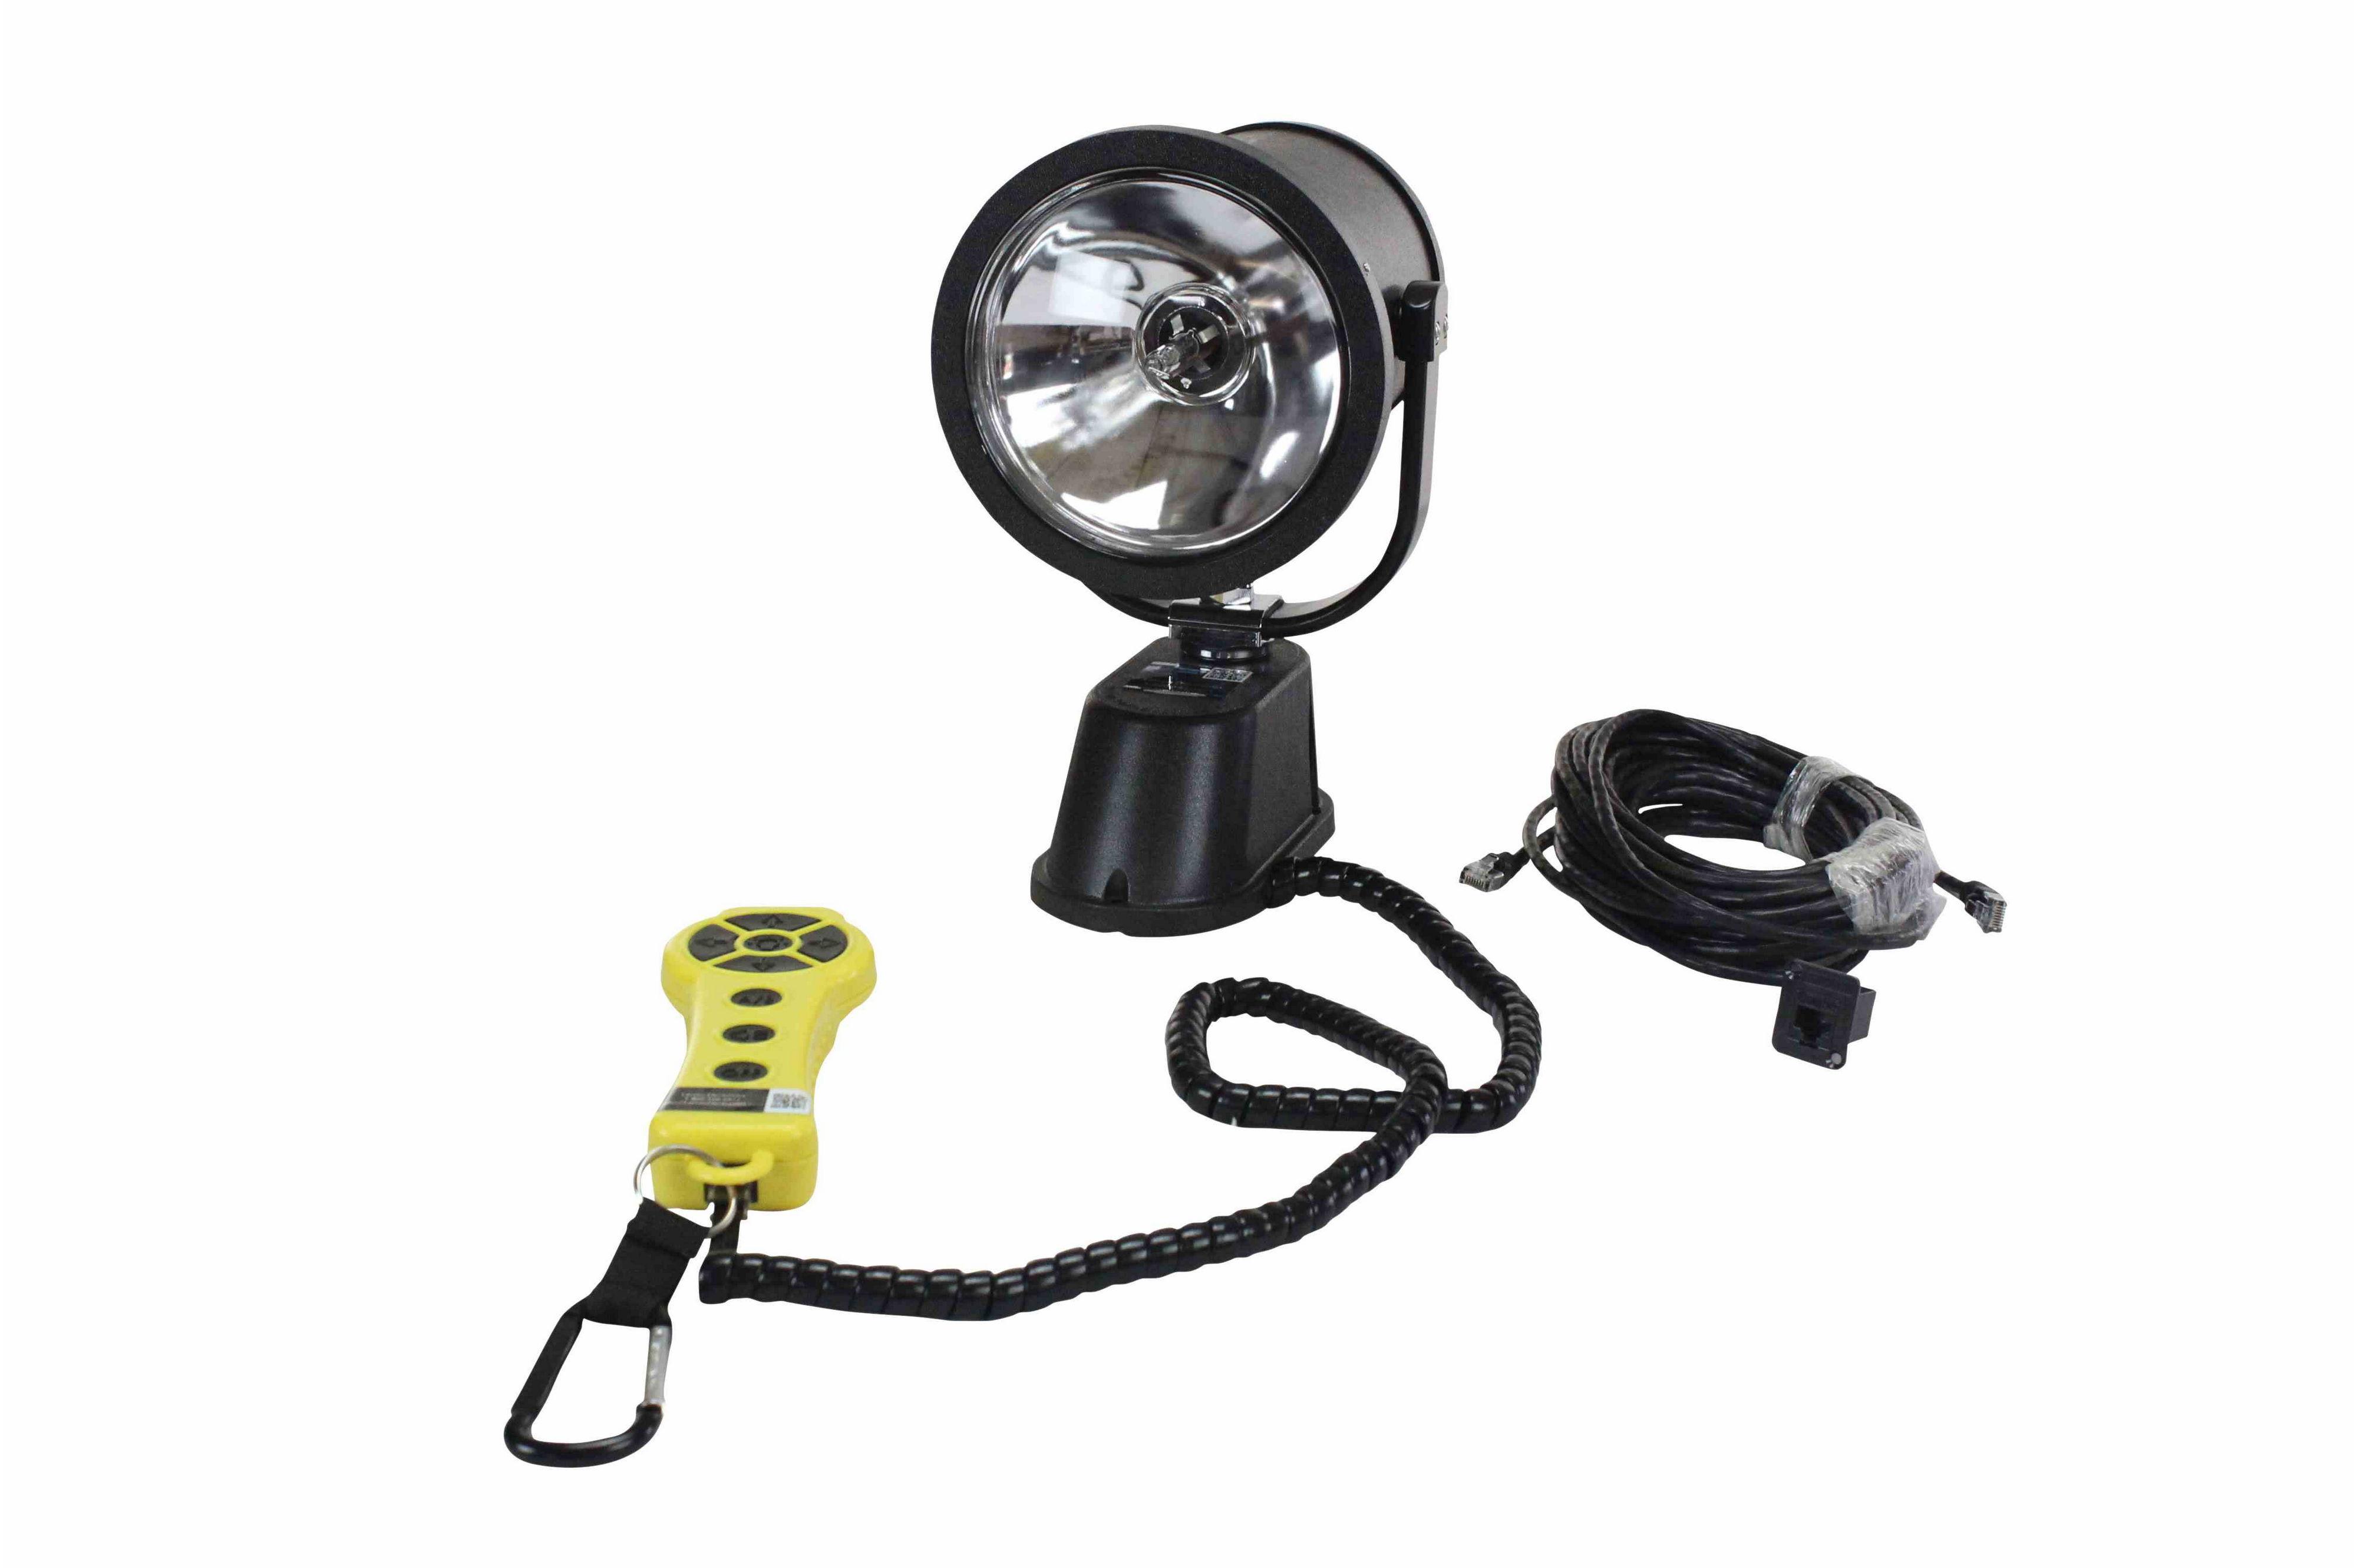 Motorized Remote Control Hid Spotlight